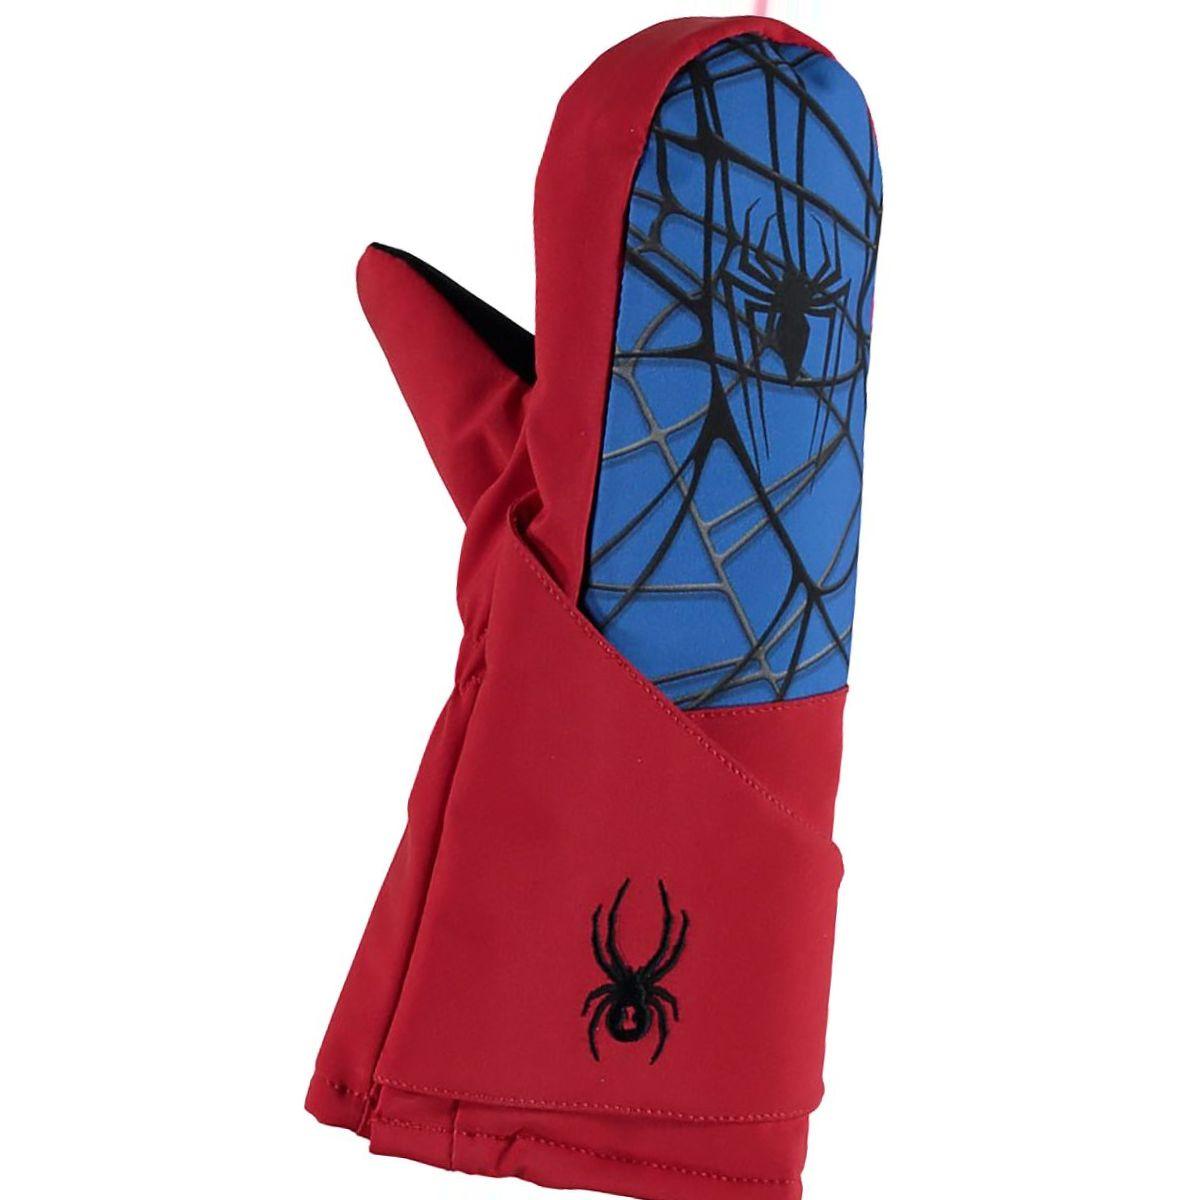 Spyder Marvel Overweb Mitten - Boys'